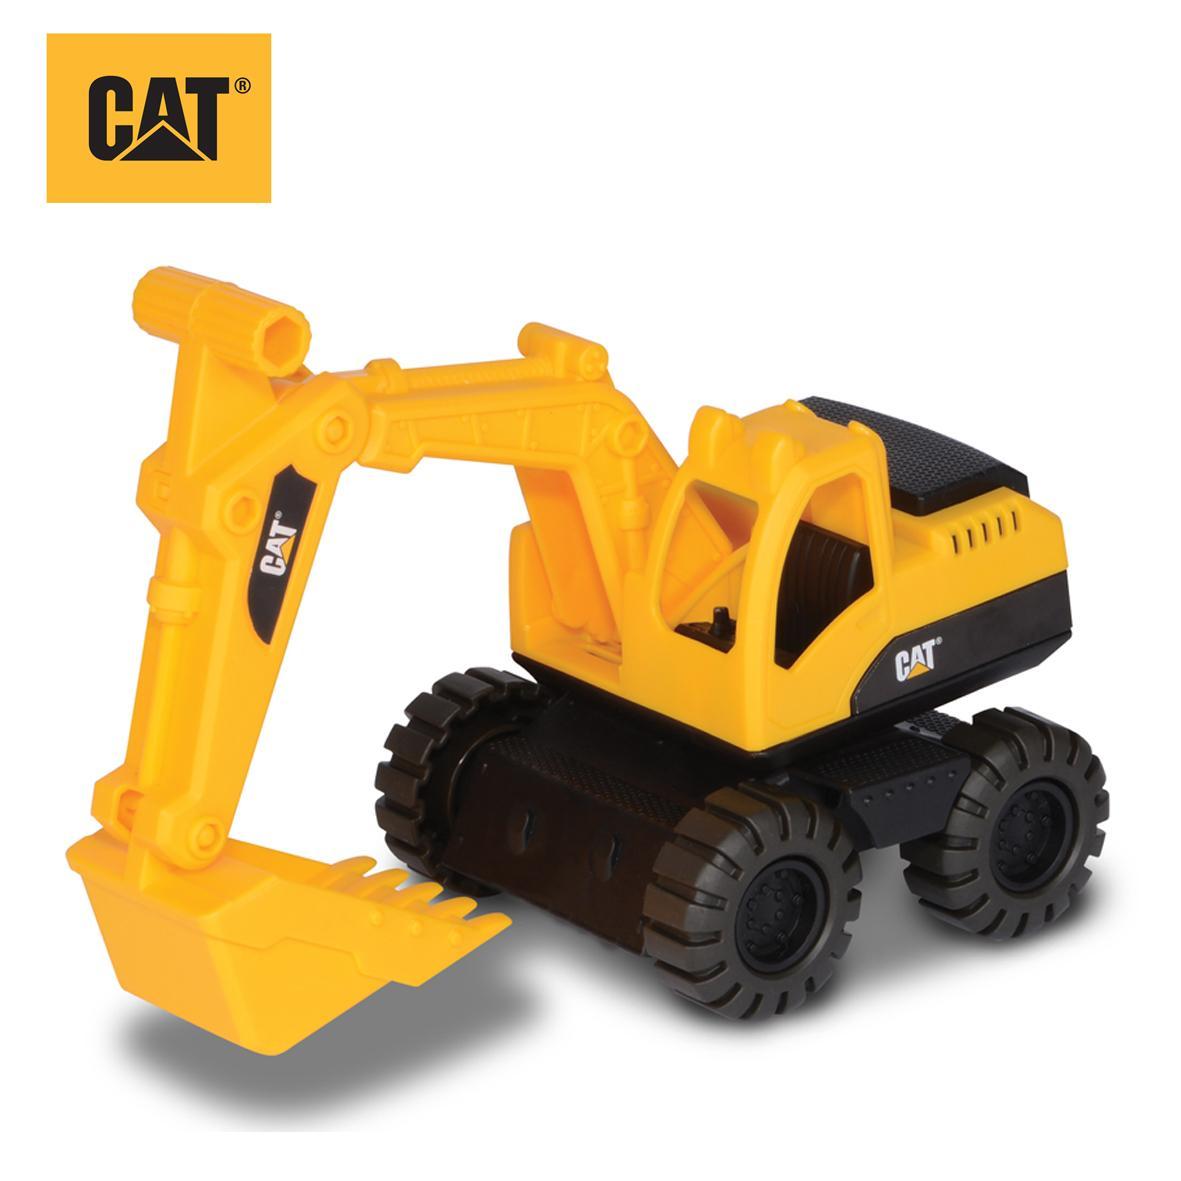 cat construction crew excavator vehicle playset. Black Bedroom Furniture Sets. Home Design Ideas